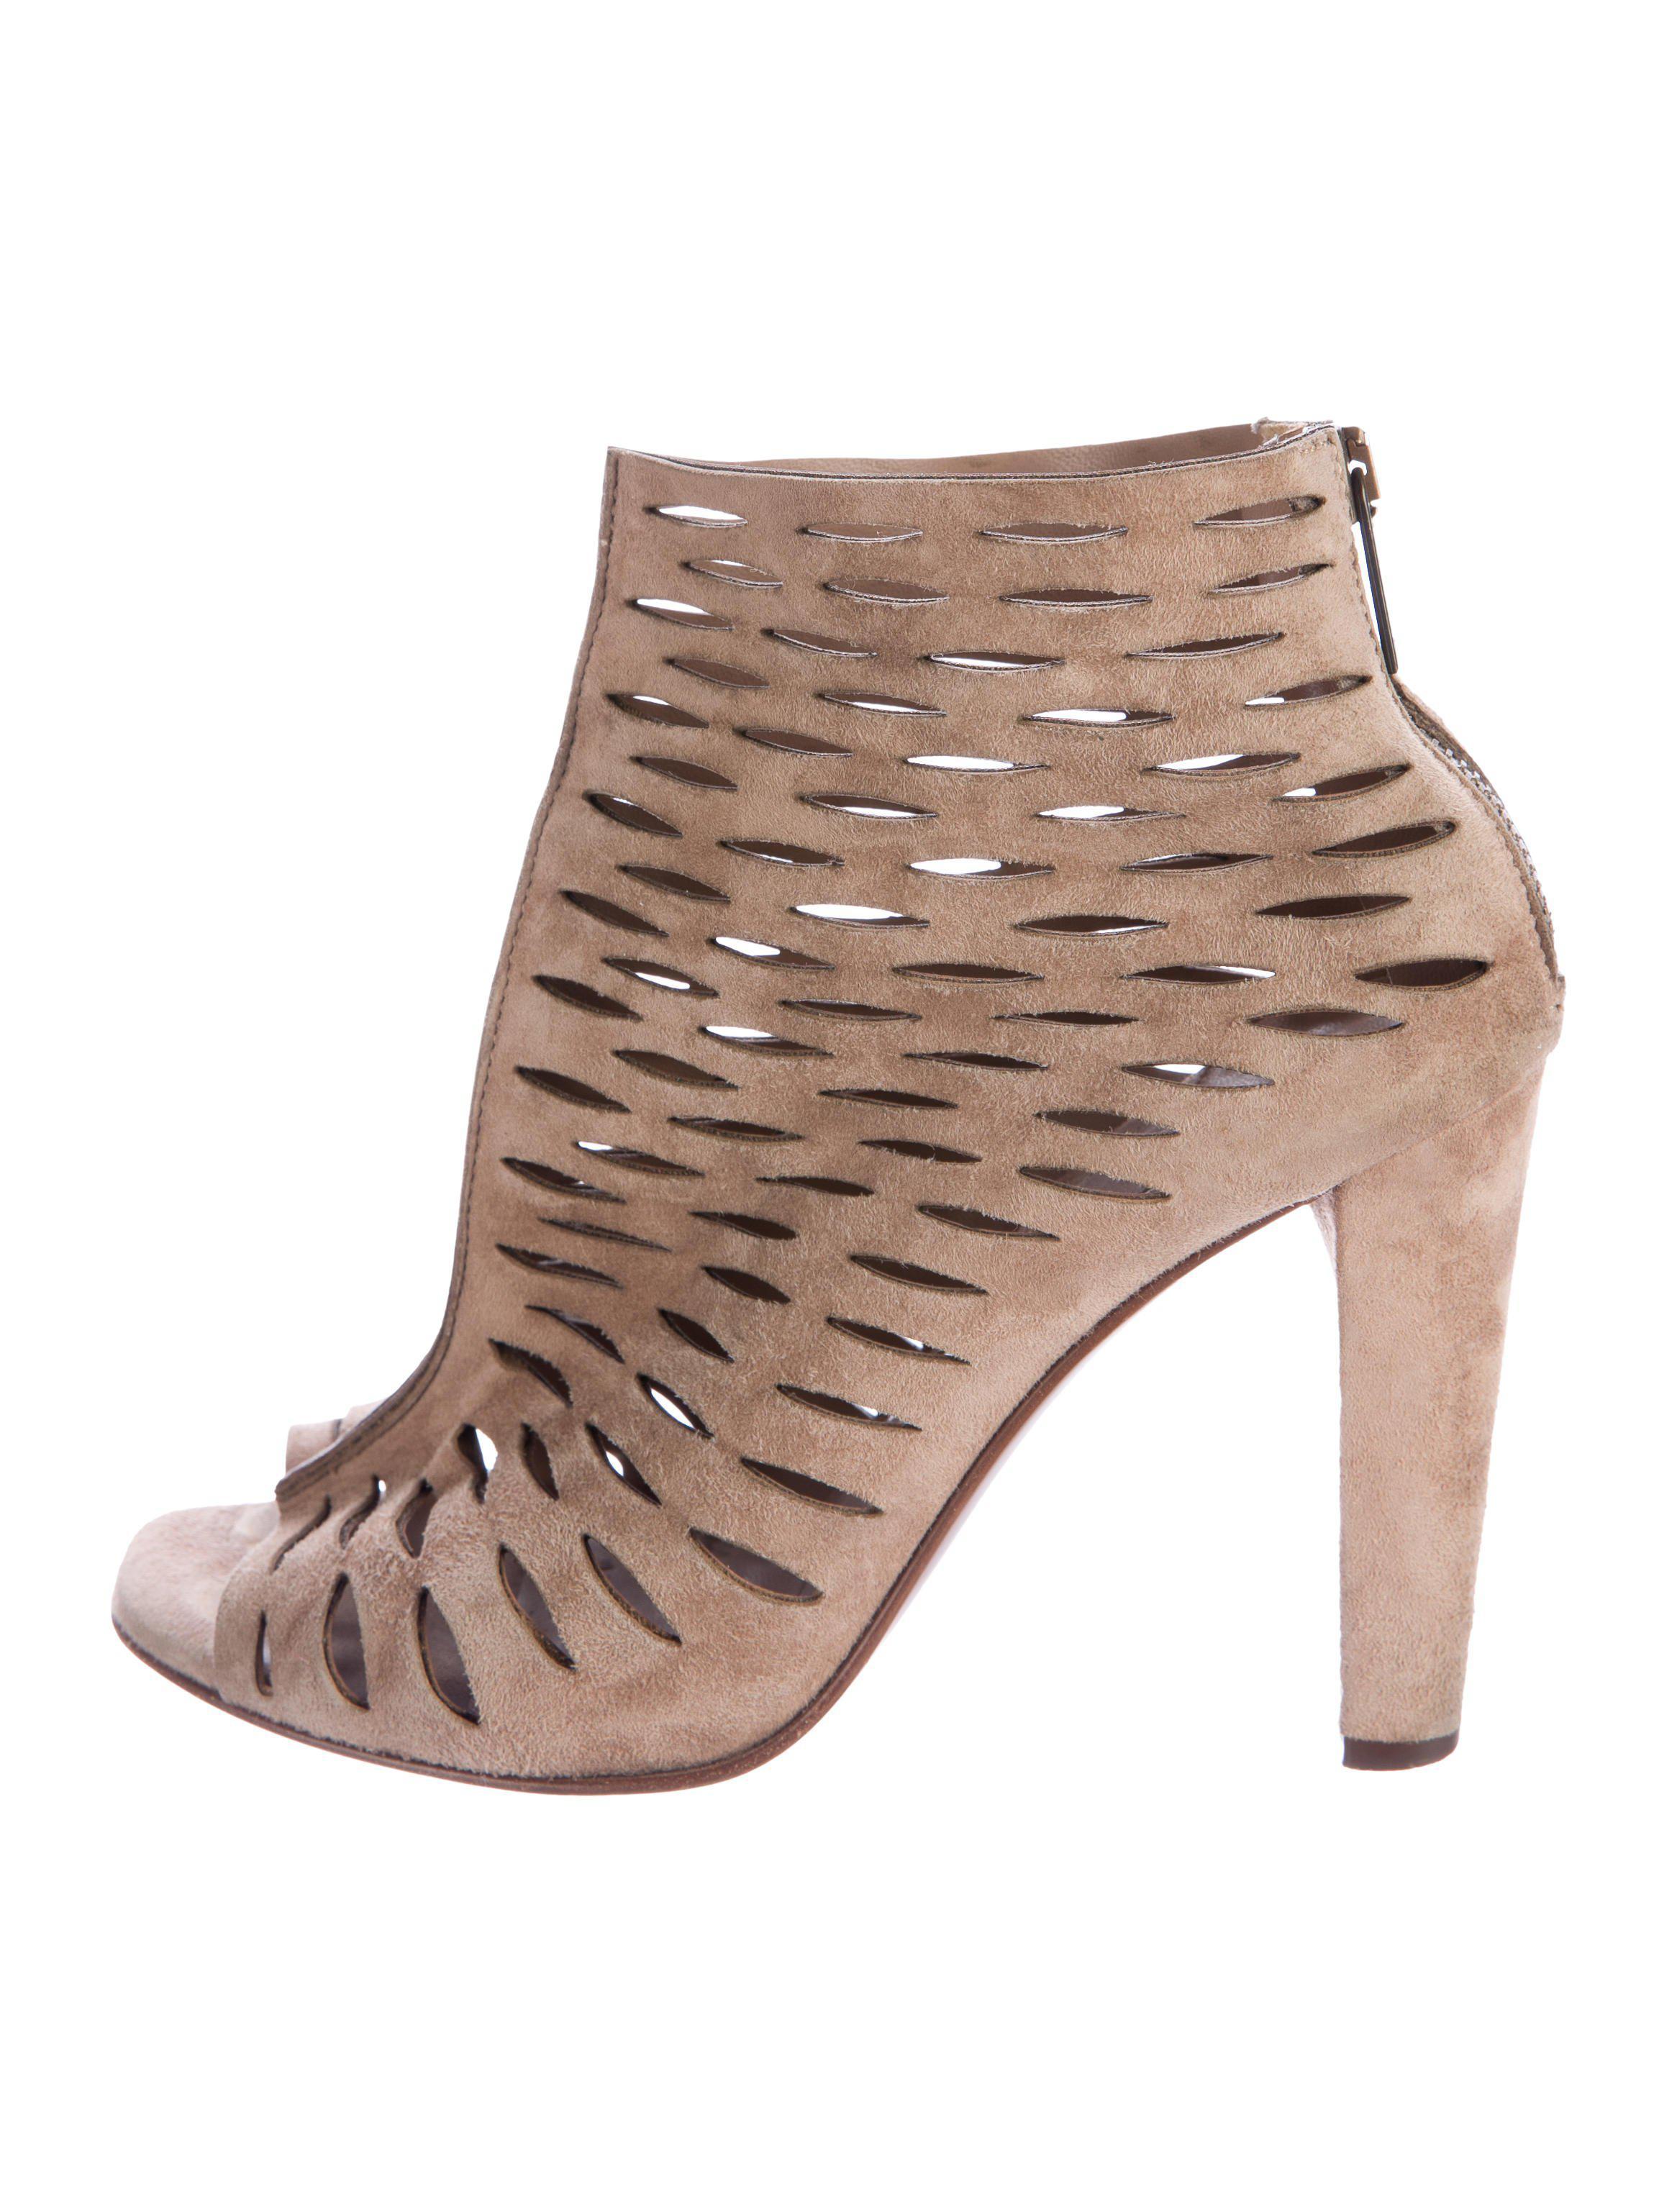 Diane von Furstenberg Alexandria Laser Cut Ankle Boots cheap sale shop offer outlet shop for good selling browse online 9l04hL